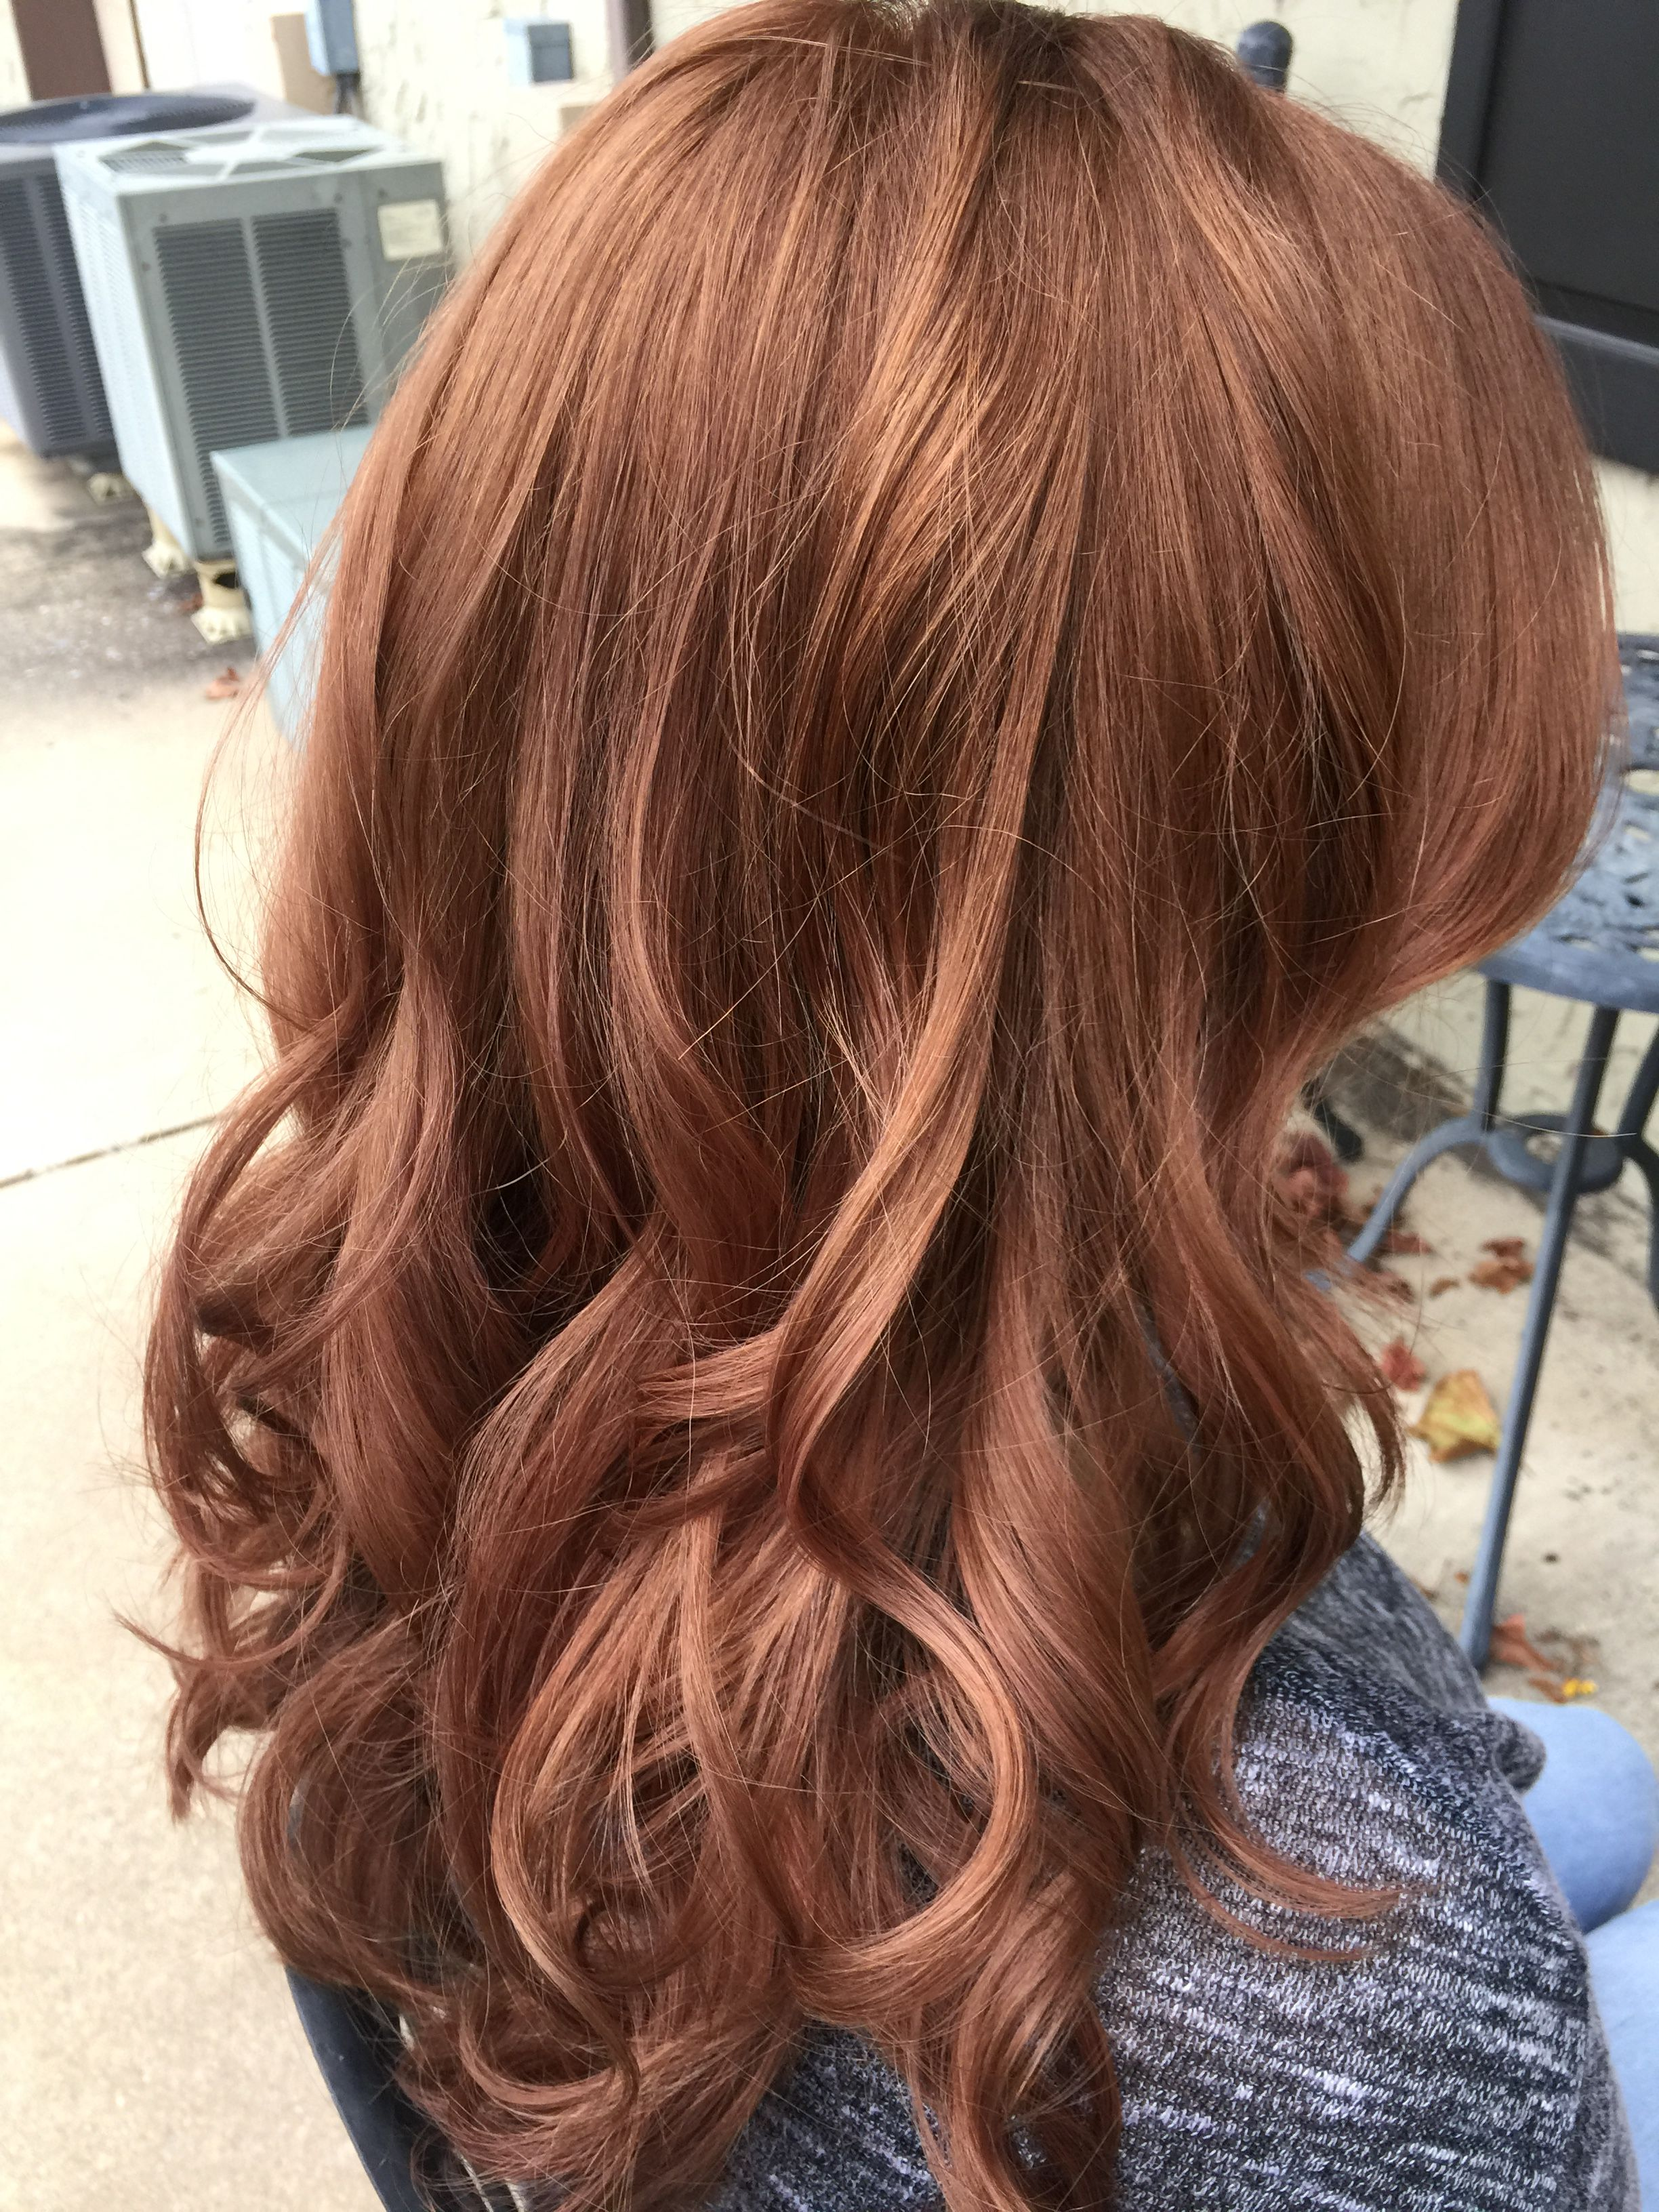 Pin by Alexa Smith on Hair